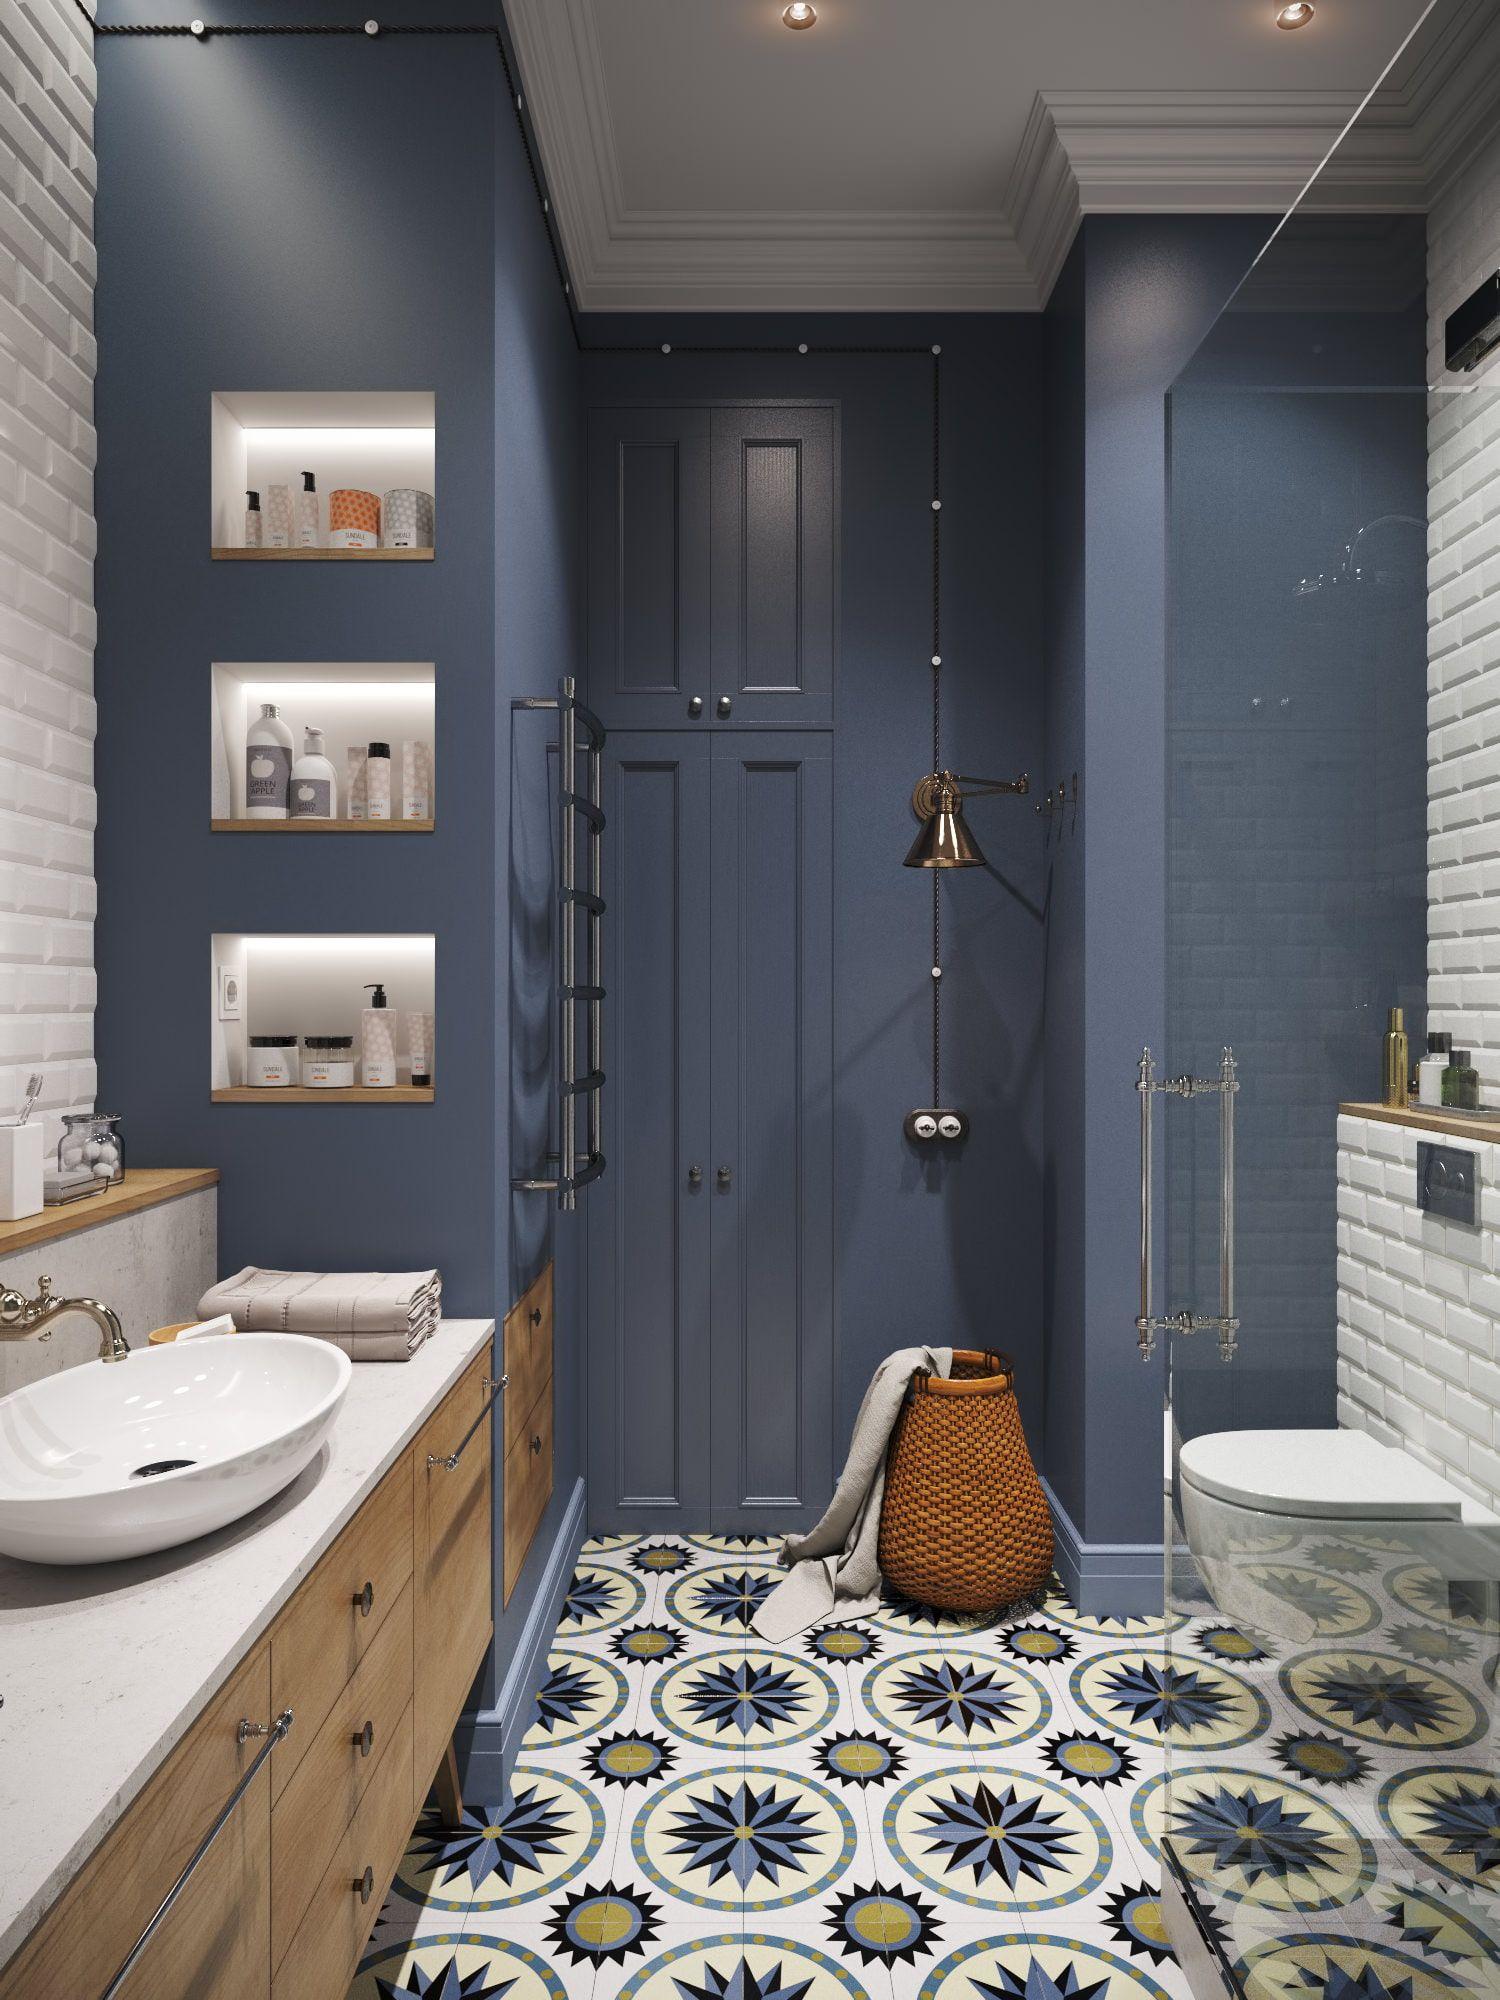 Дизайн квартиры 100 кв. м. – идеи обустройства, фото в ...